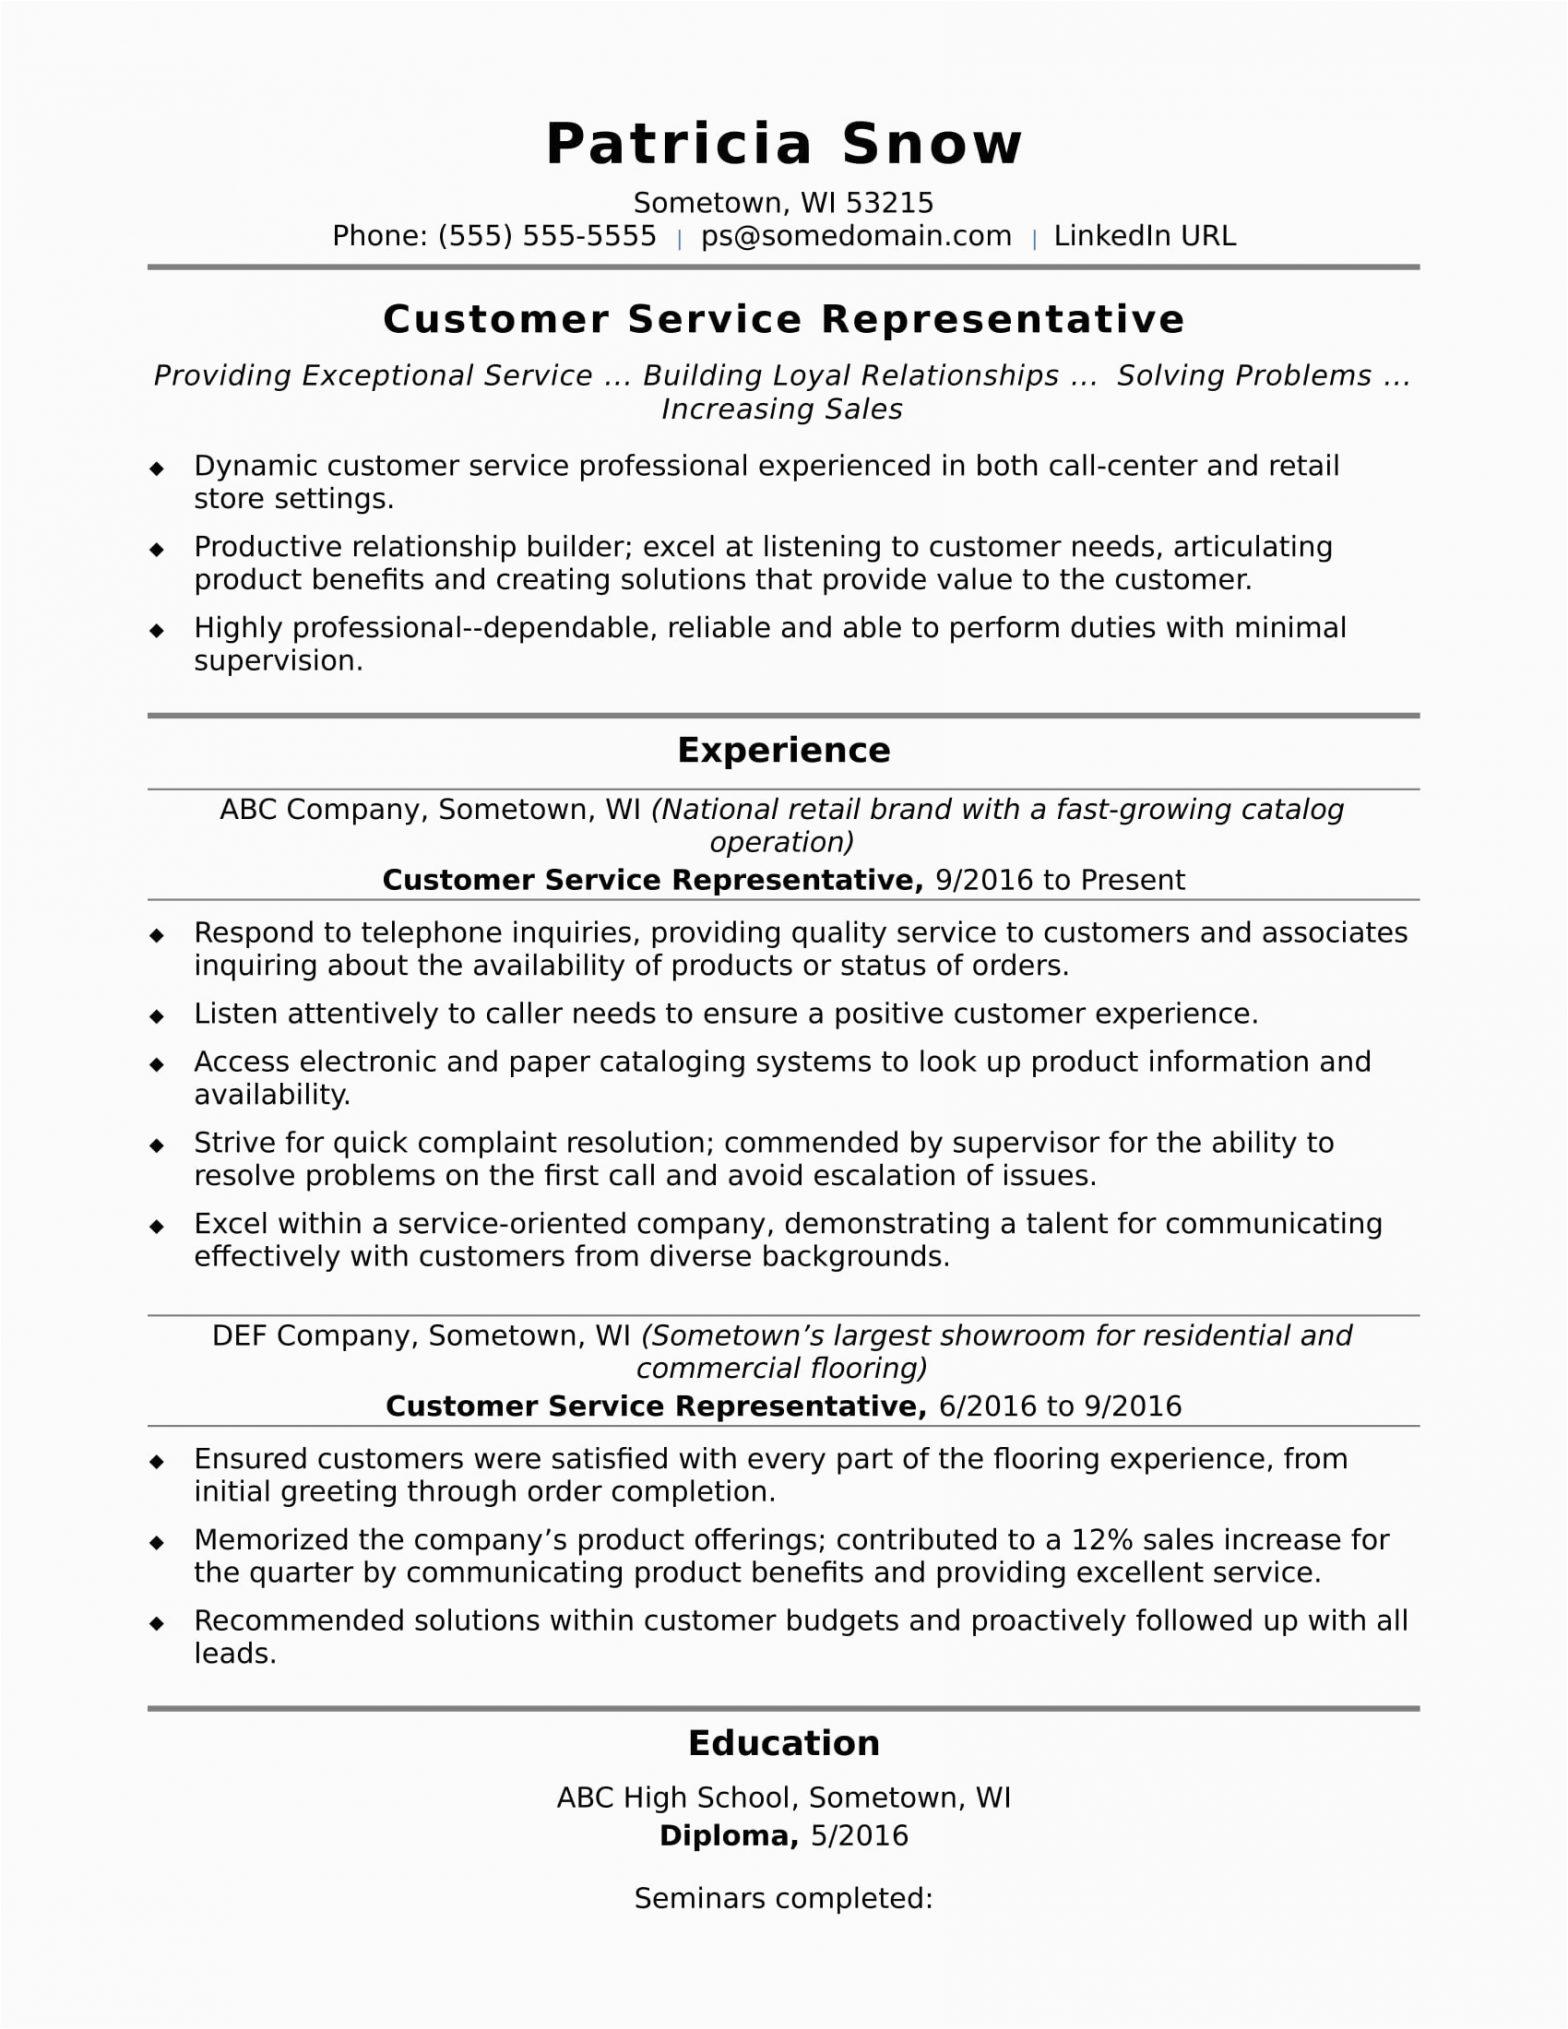 Sample Resume Customer Service Representative Skills Customer Service Representative Resume Sample